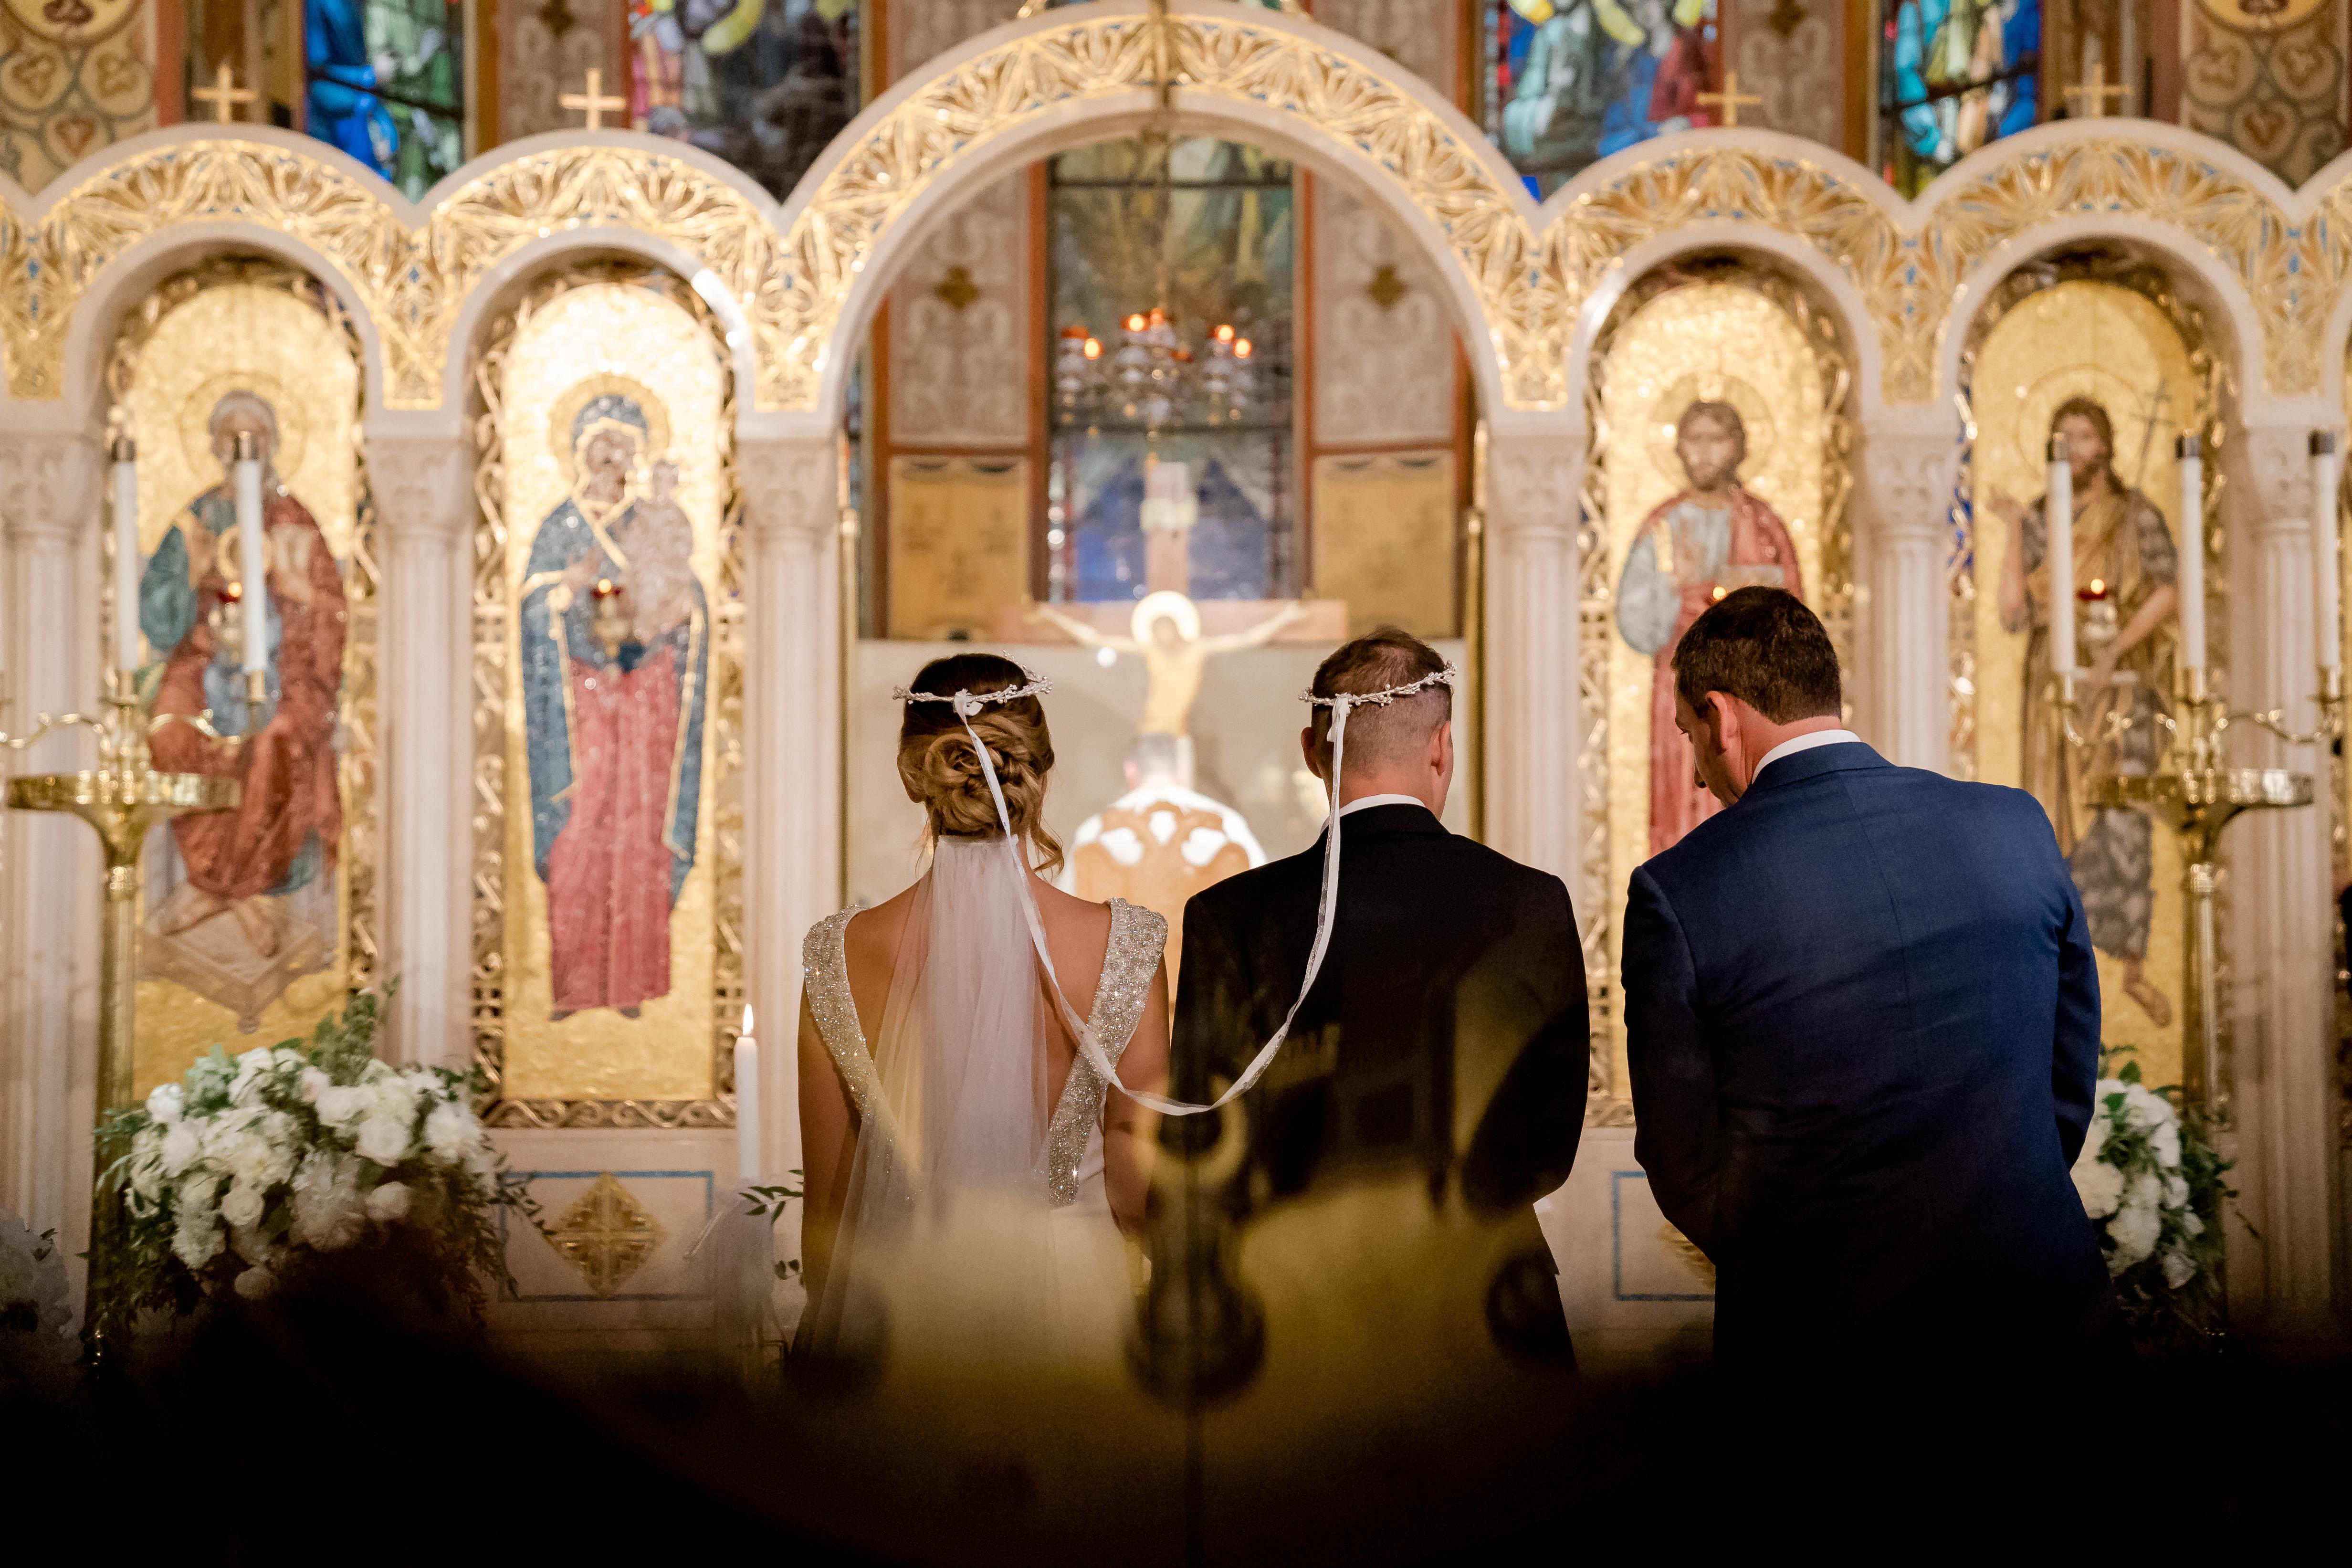 6 Essential Christian Wedding Traditions